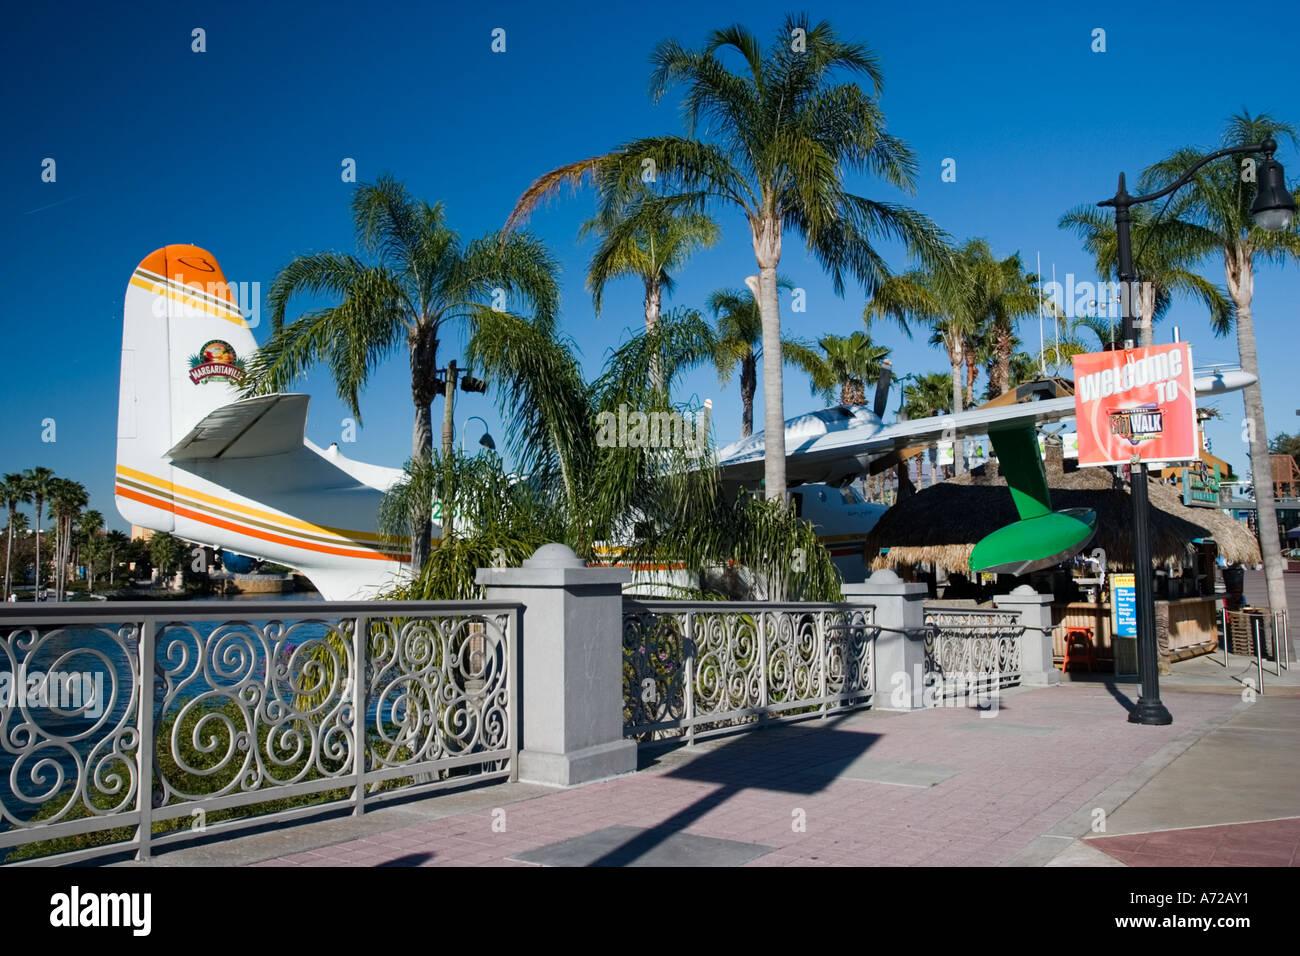 Margaritaville Bar And Restaurant Citywalk Universal Orlando Resort